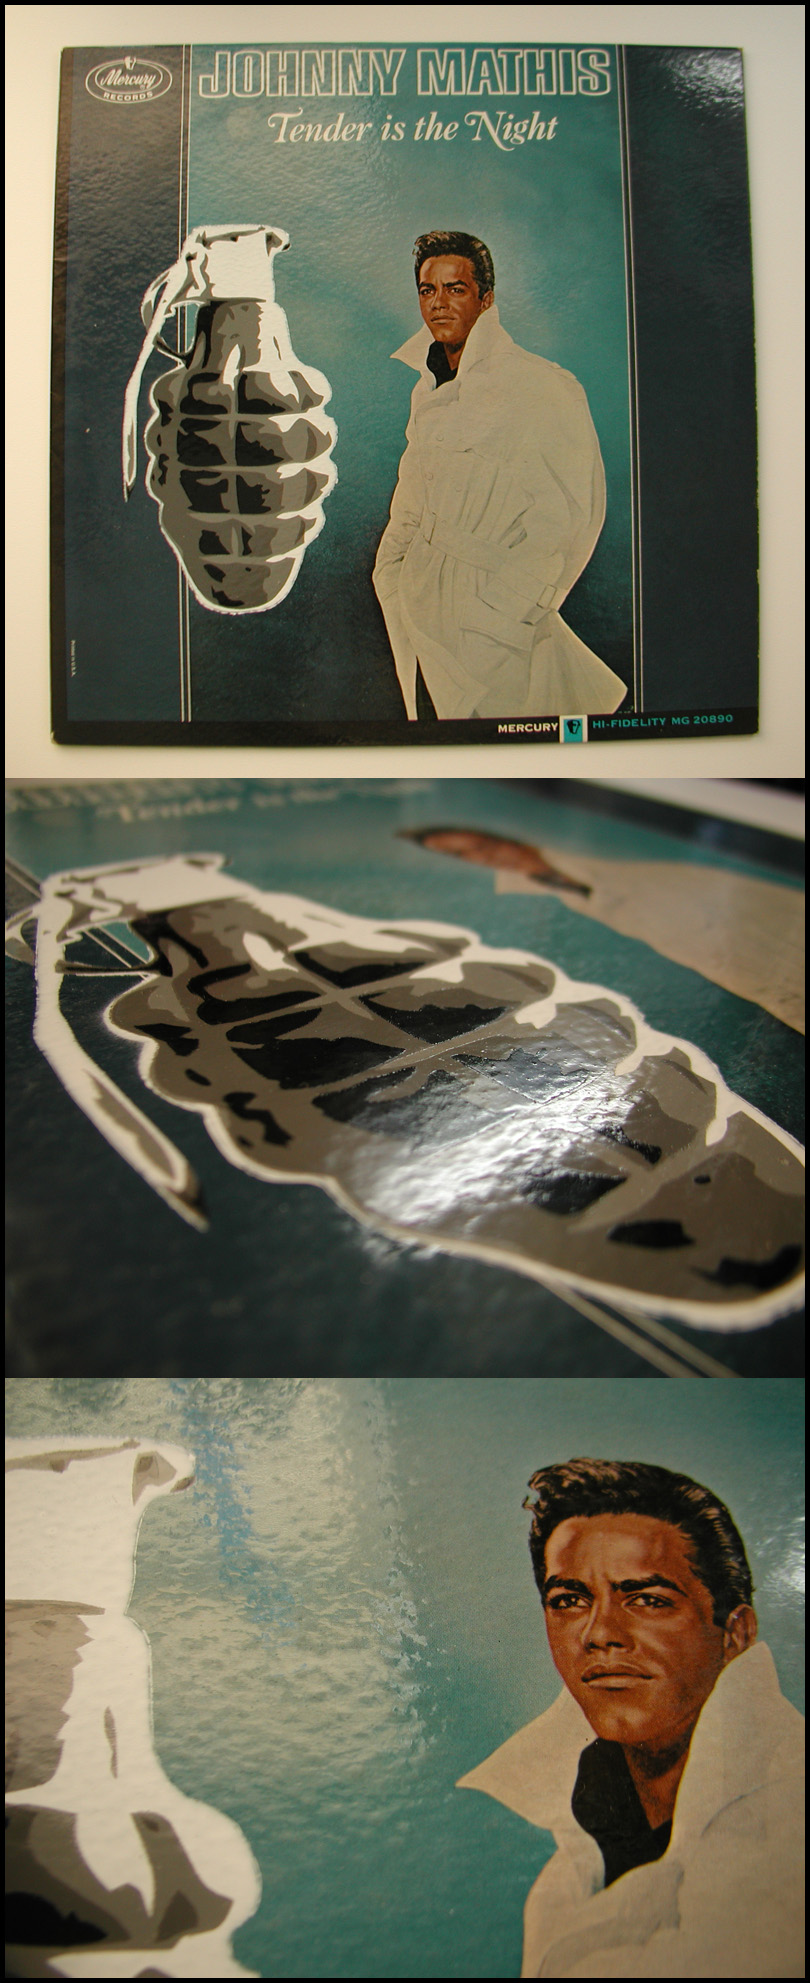 Grenade Johnny Mathis by truemarmalade